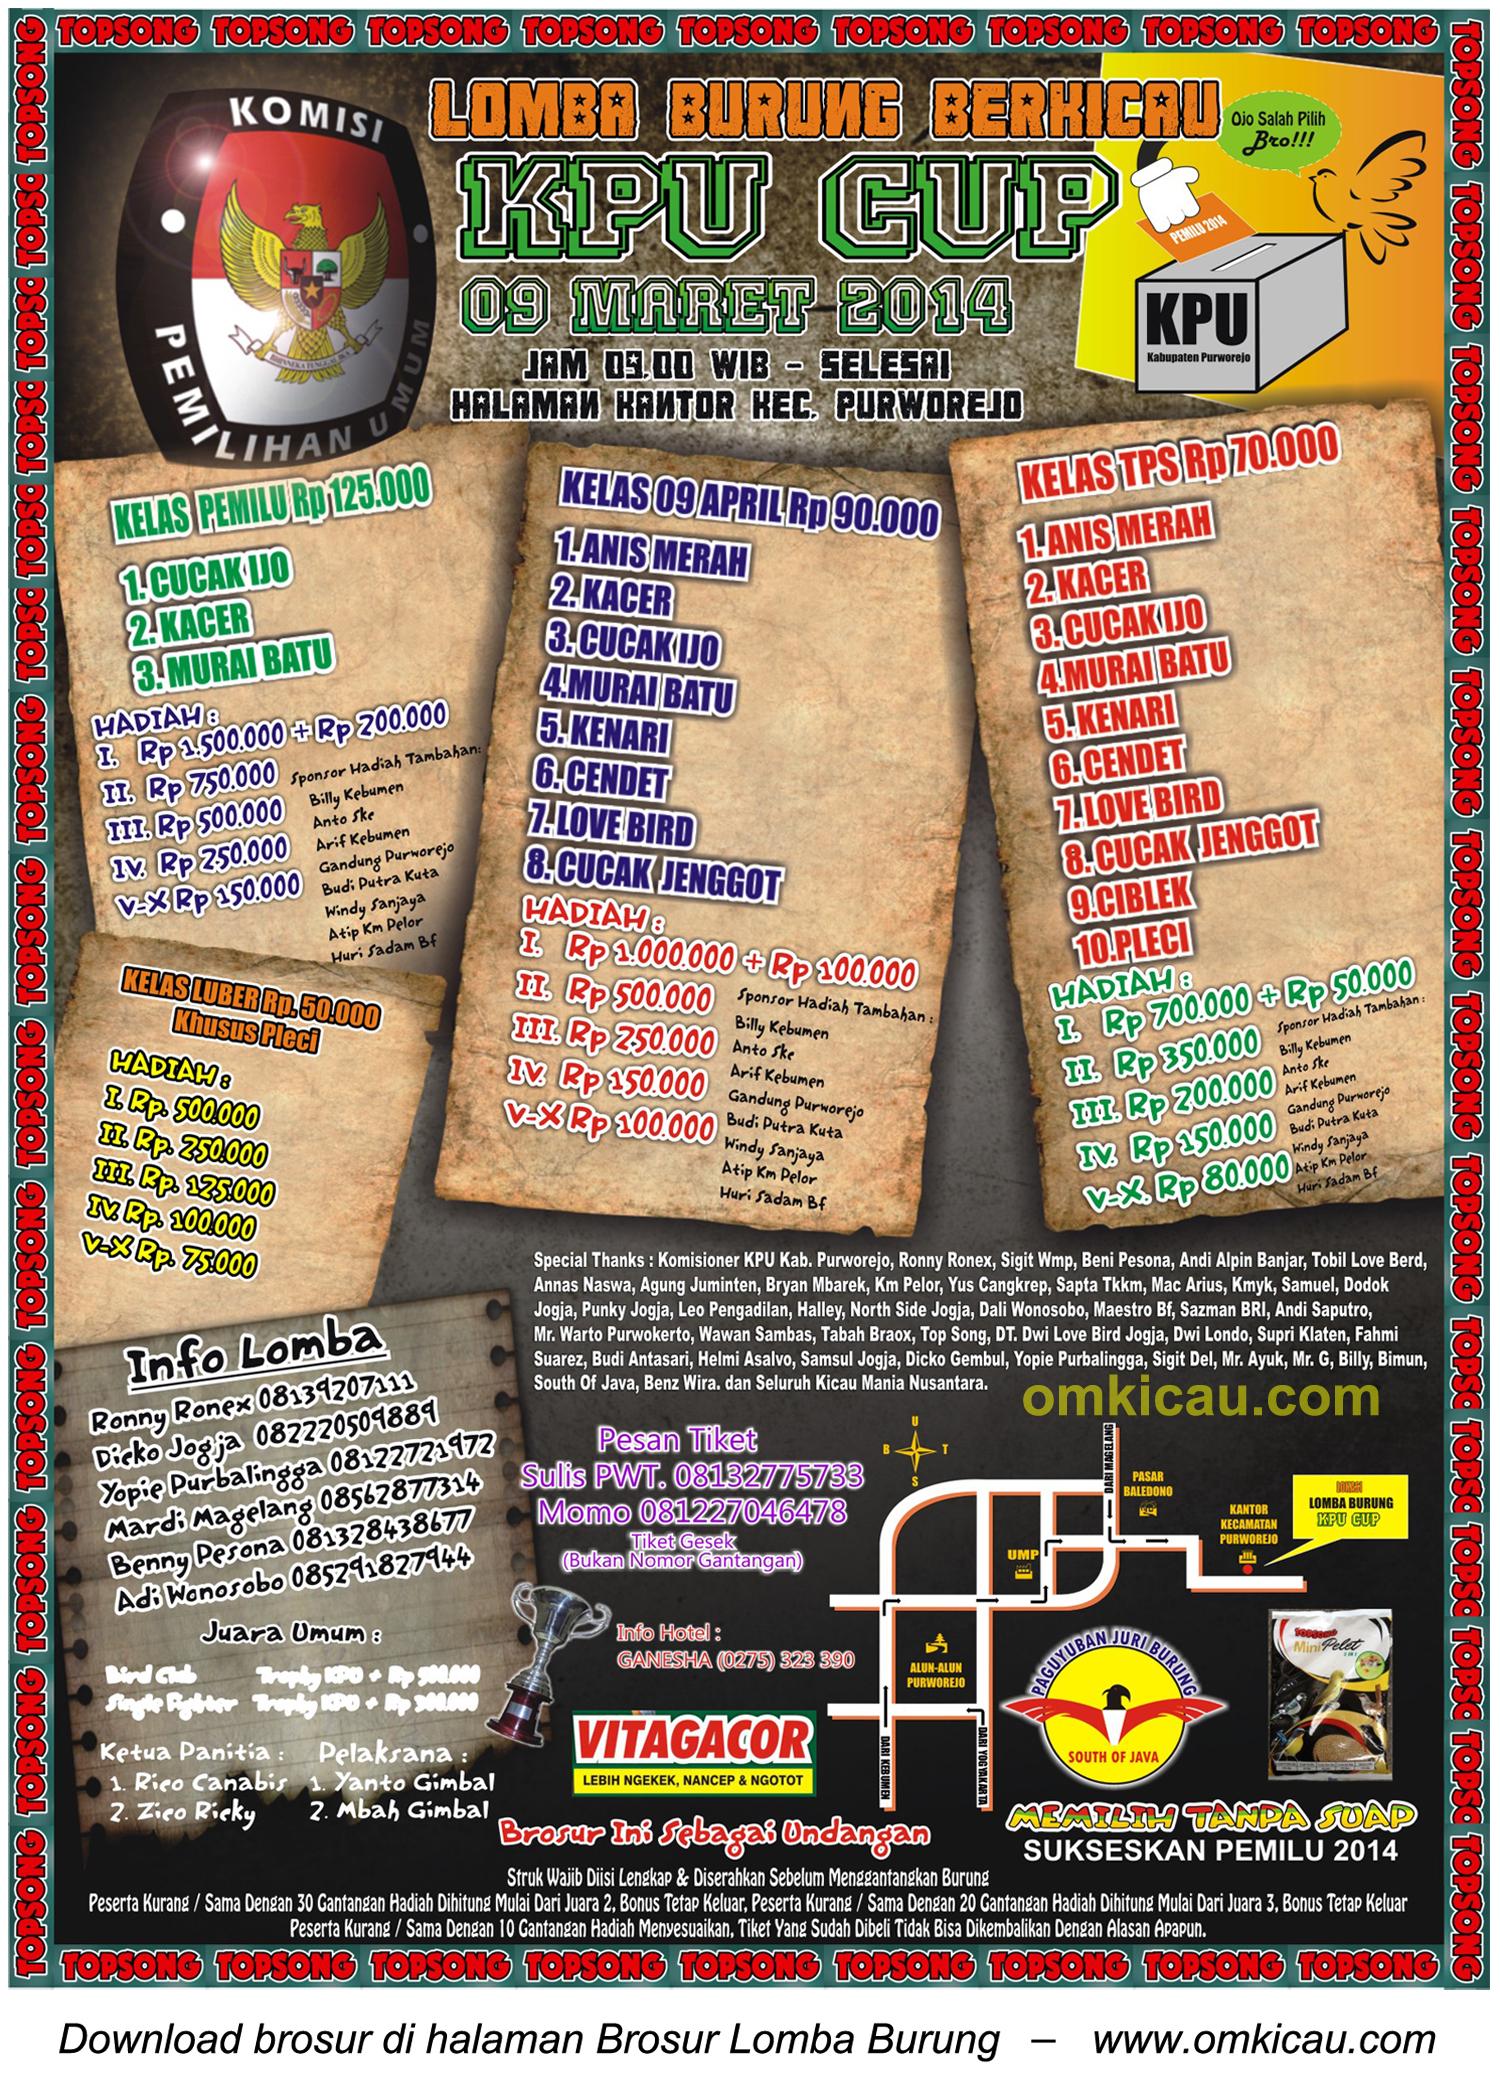 Brosur Lomba Burung Berkicau KPU Cup, Purworejo, 9 Maret 2014